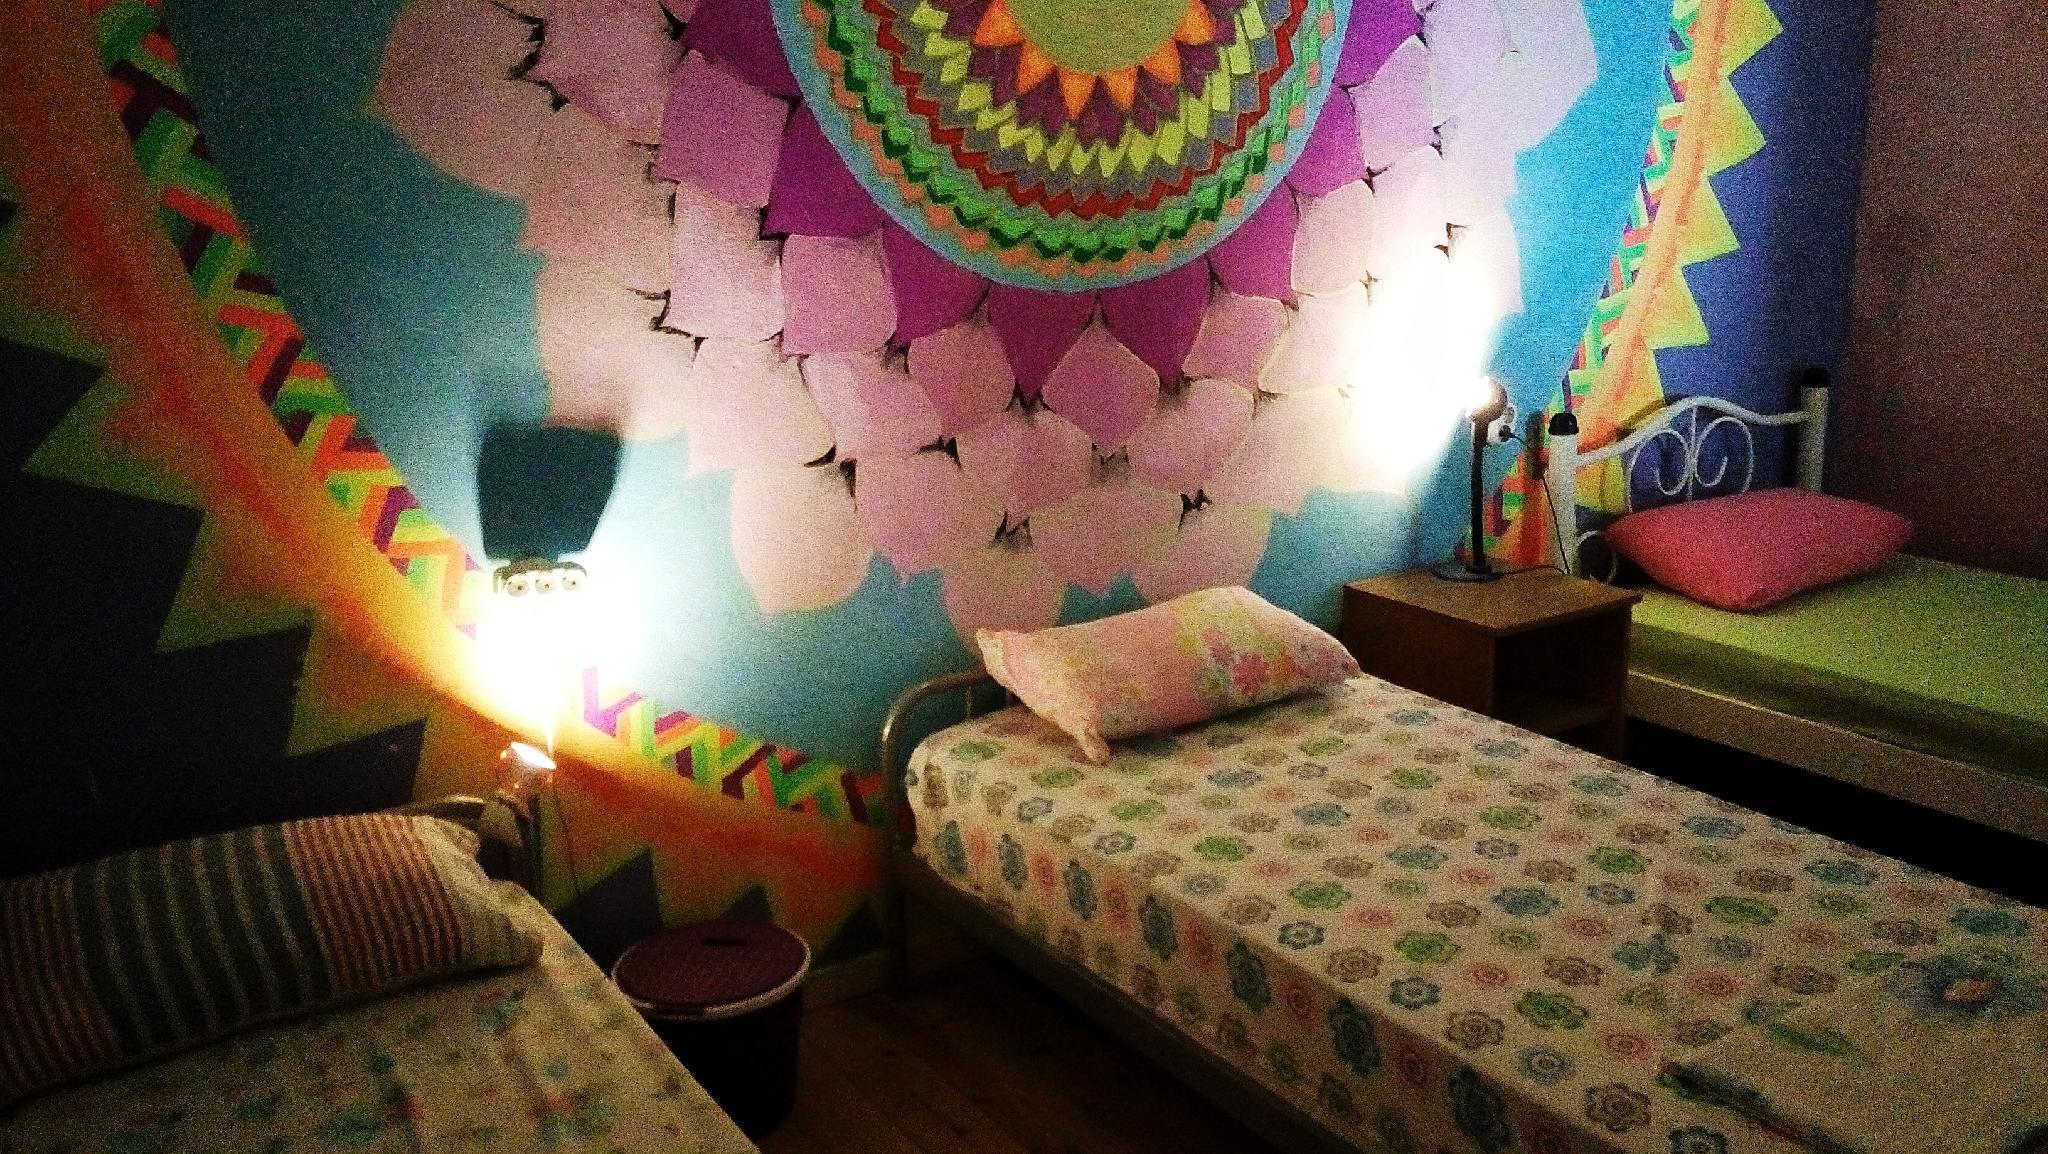 Shantihome Hostel Izmir